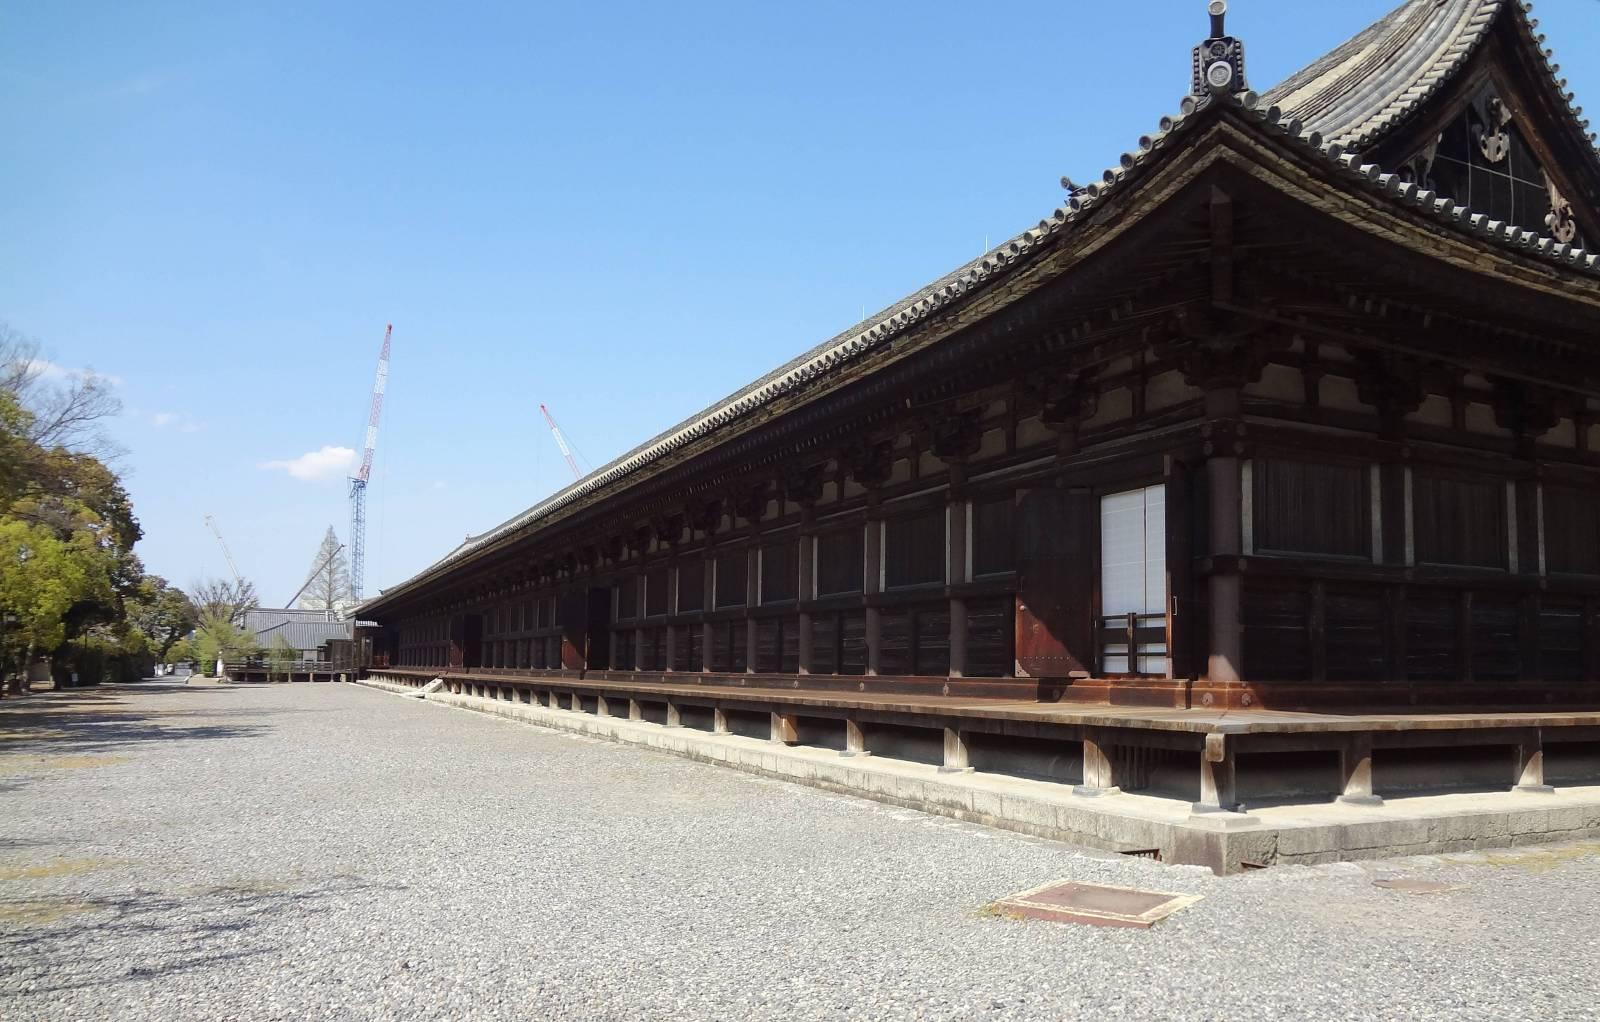 Kyoto travel guide area by area: Southern Higashiyama - youinJapan.net